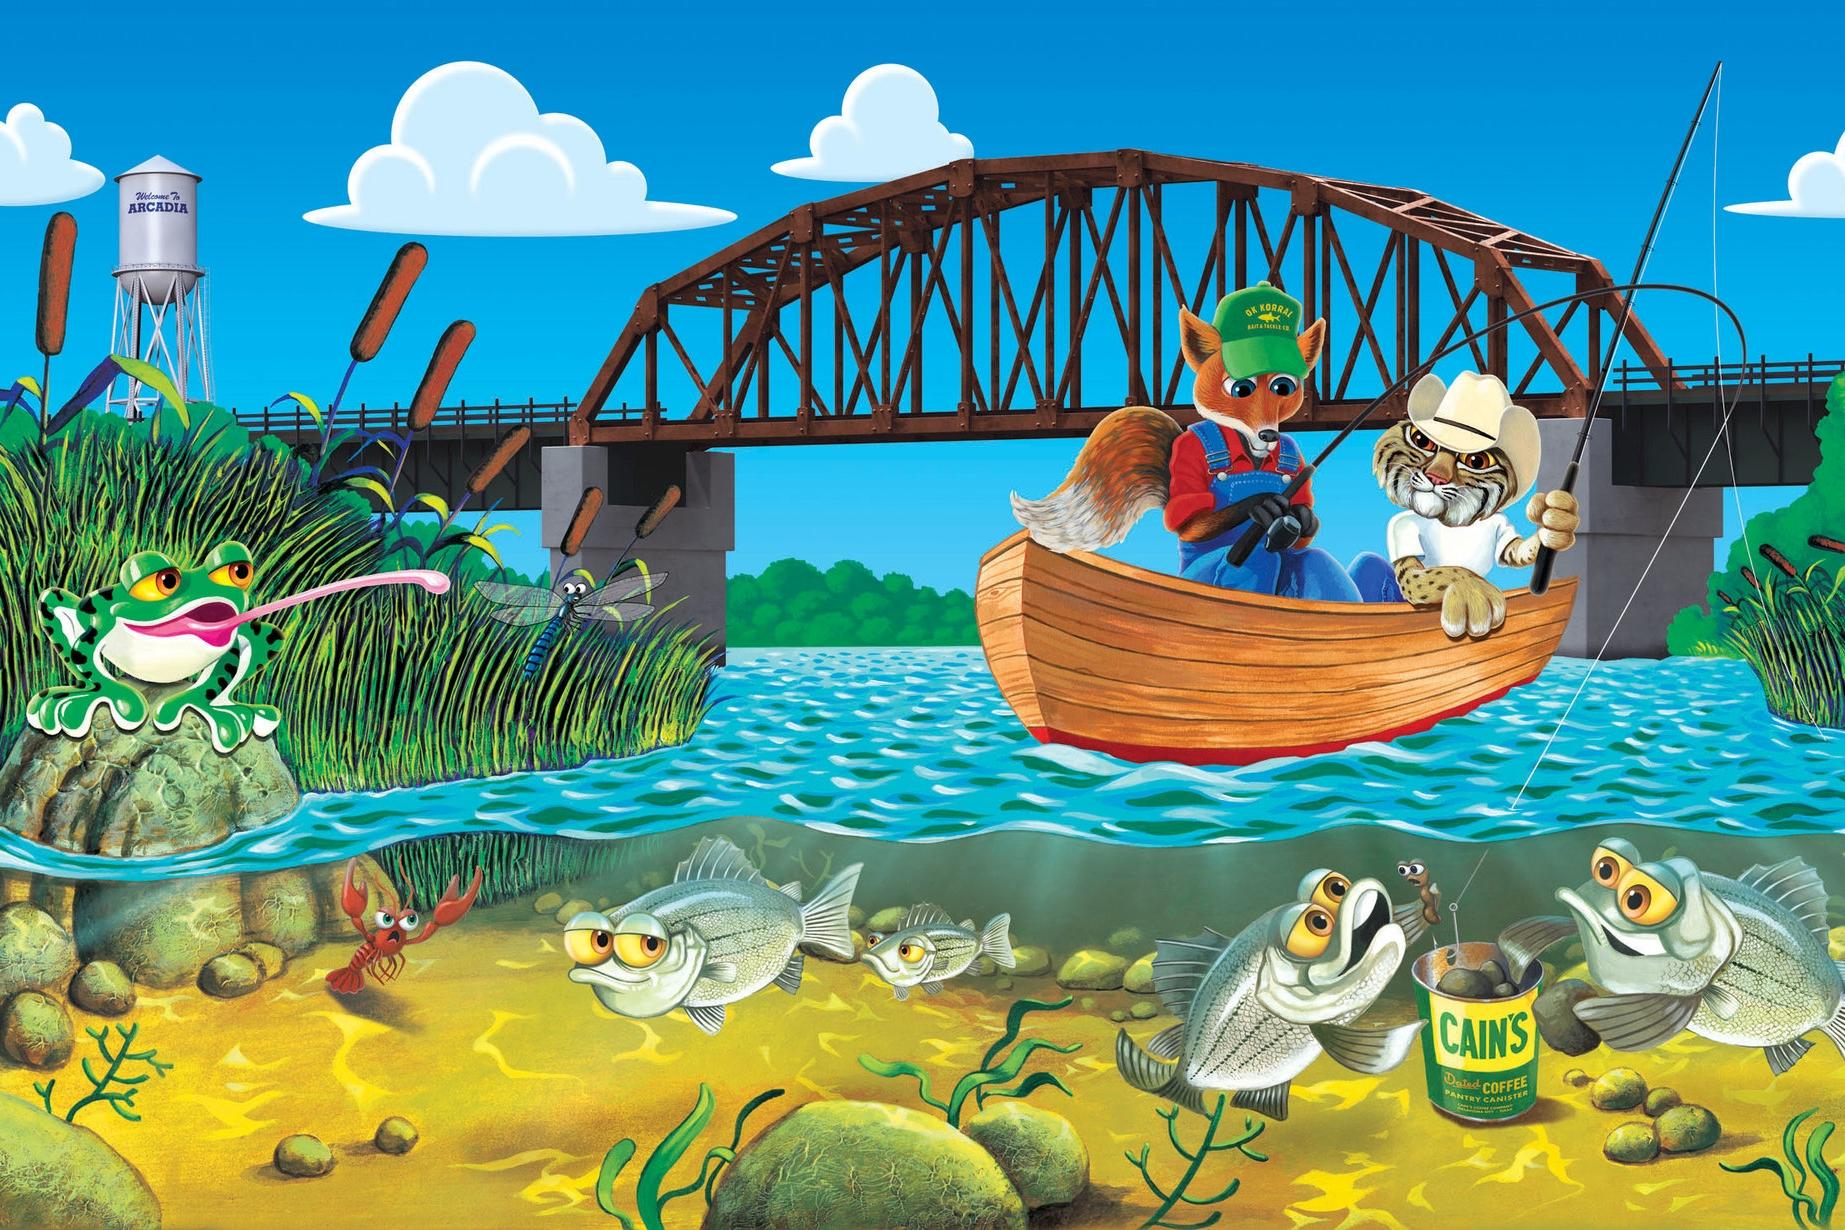 Themed Mural Scene of Local Animals Fishing